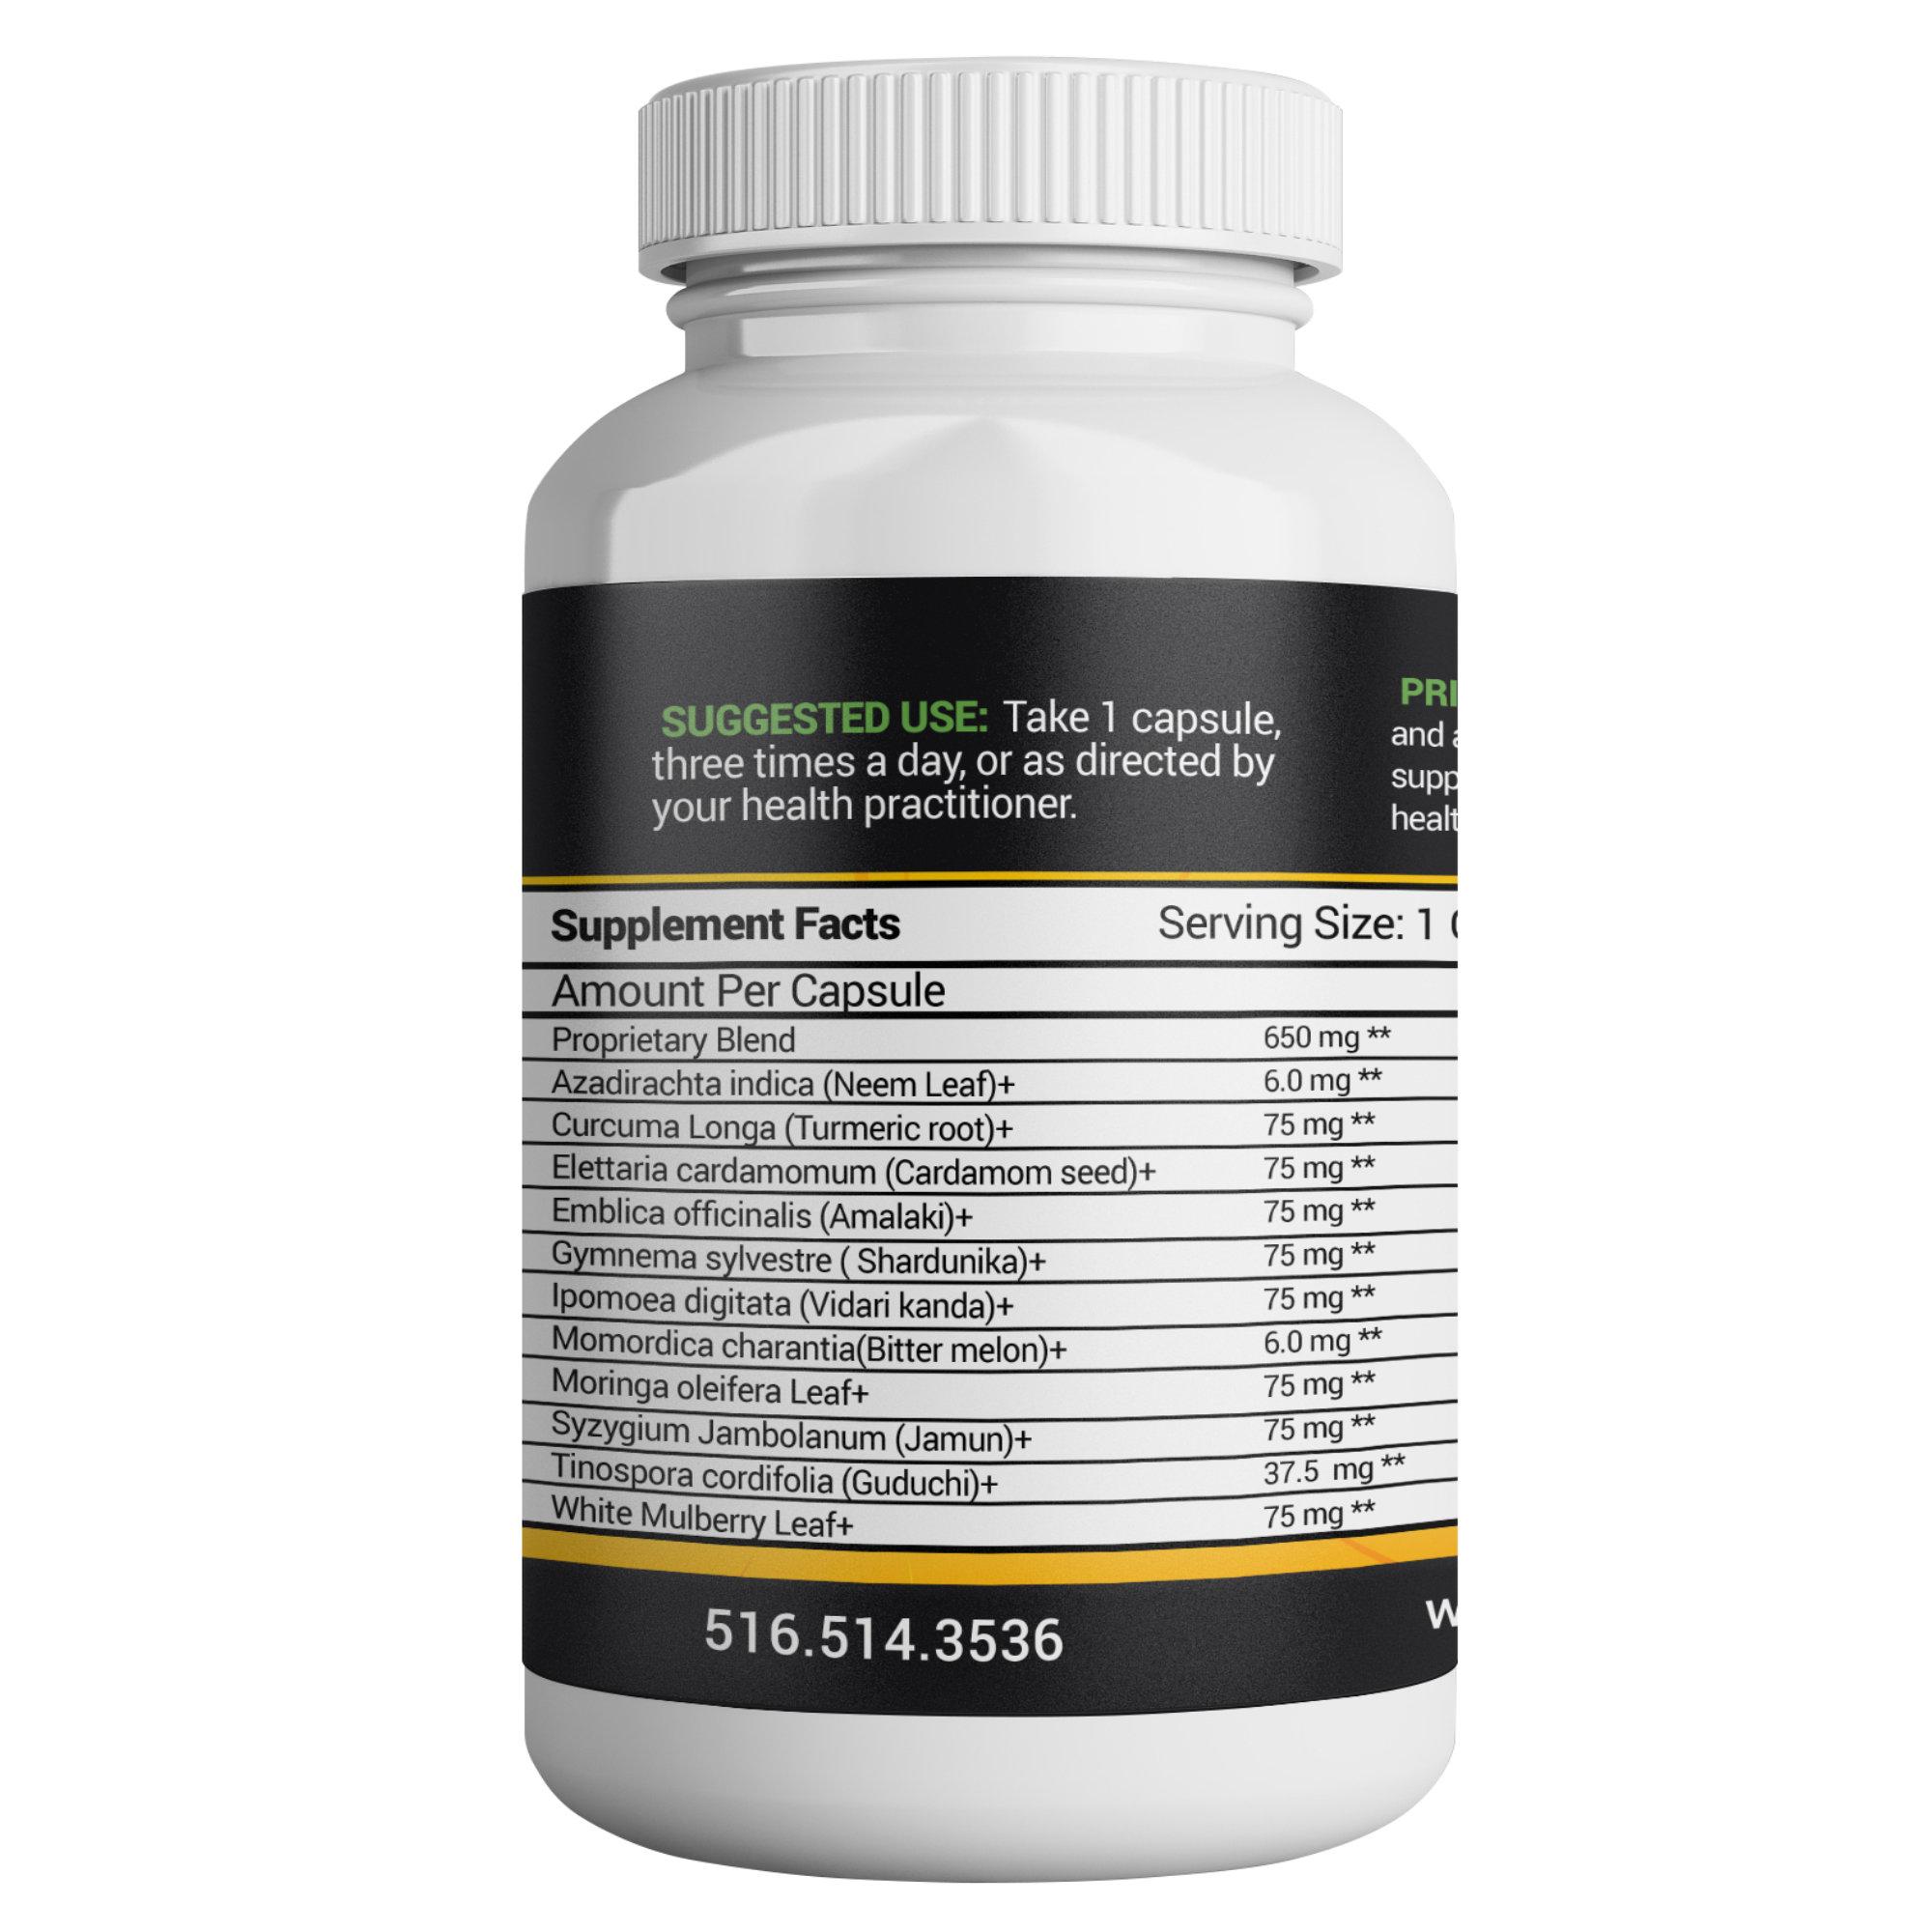 Prime Blood Sugar Support Supplement